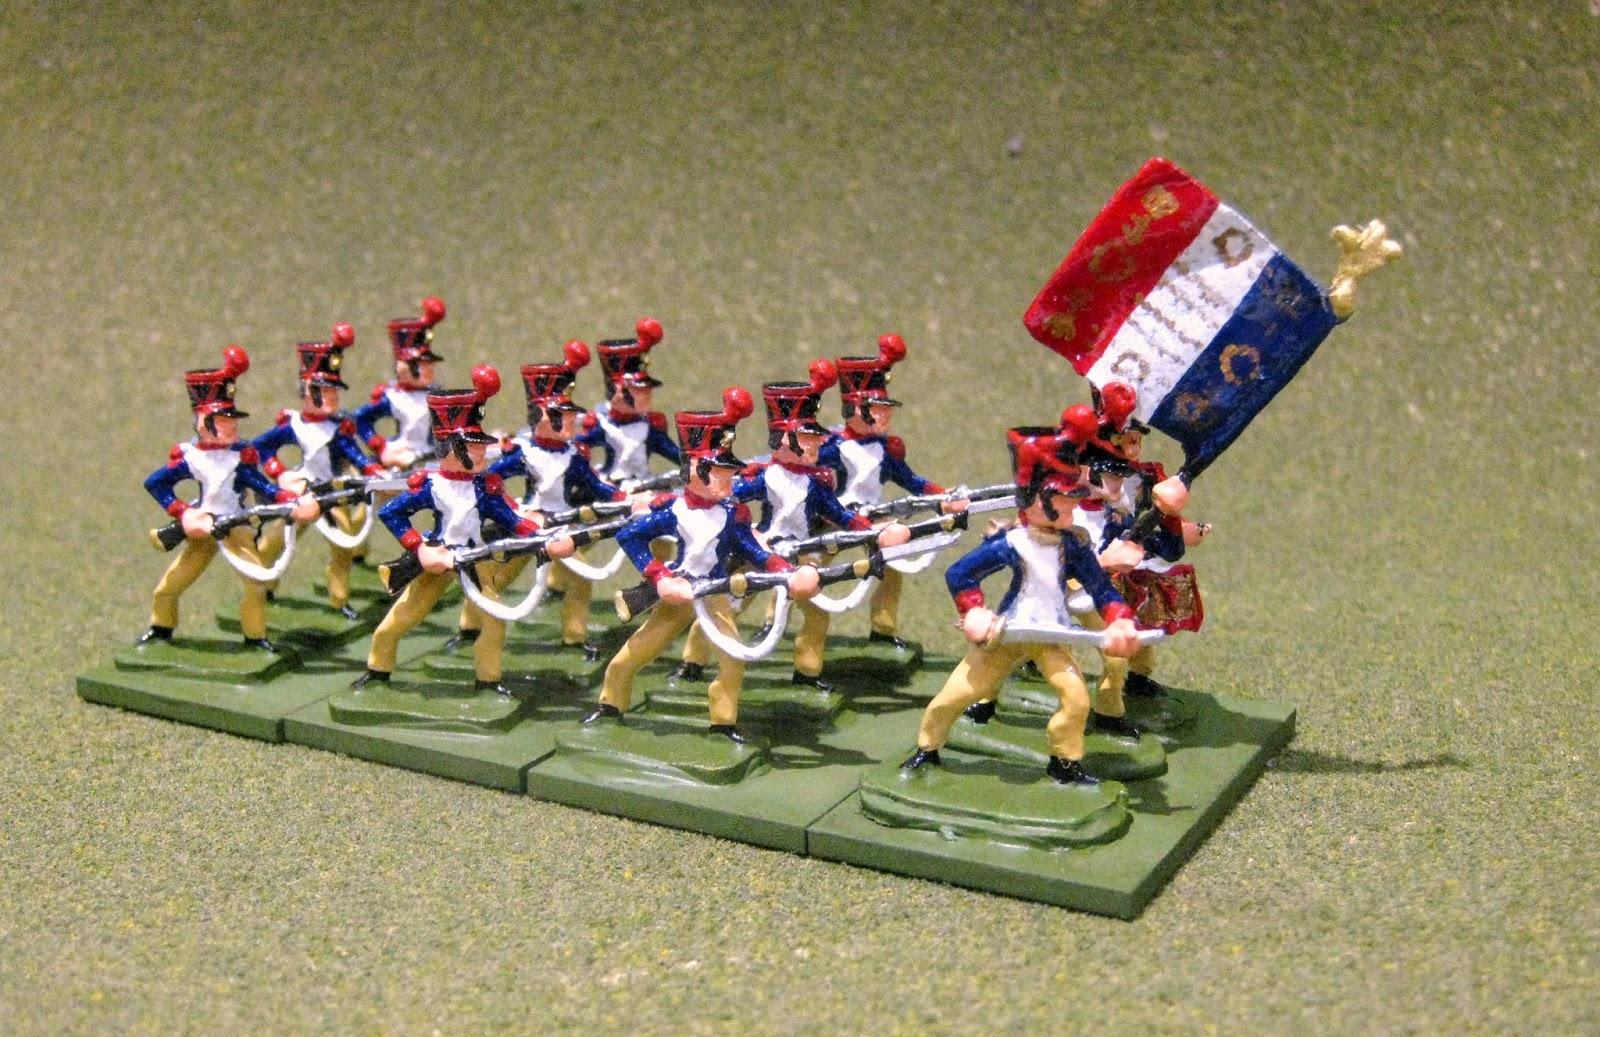 20mm Crimean War Wargaming Other Stuff Peninsular